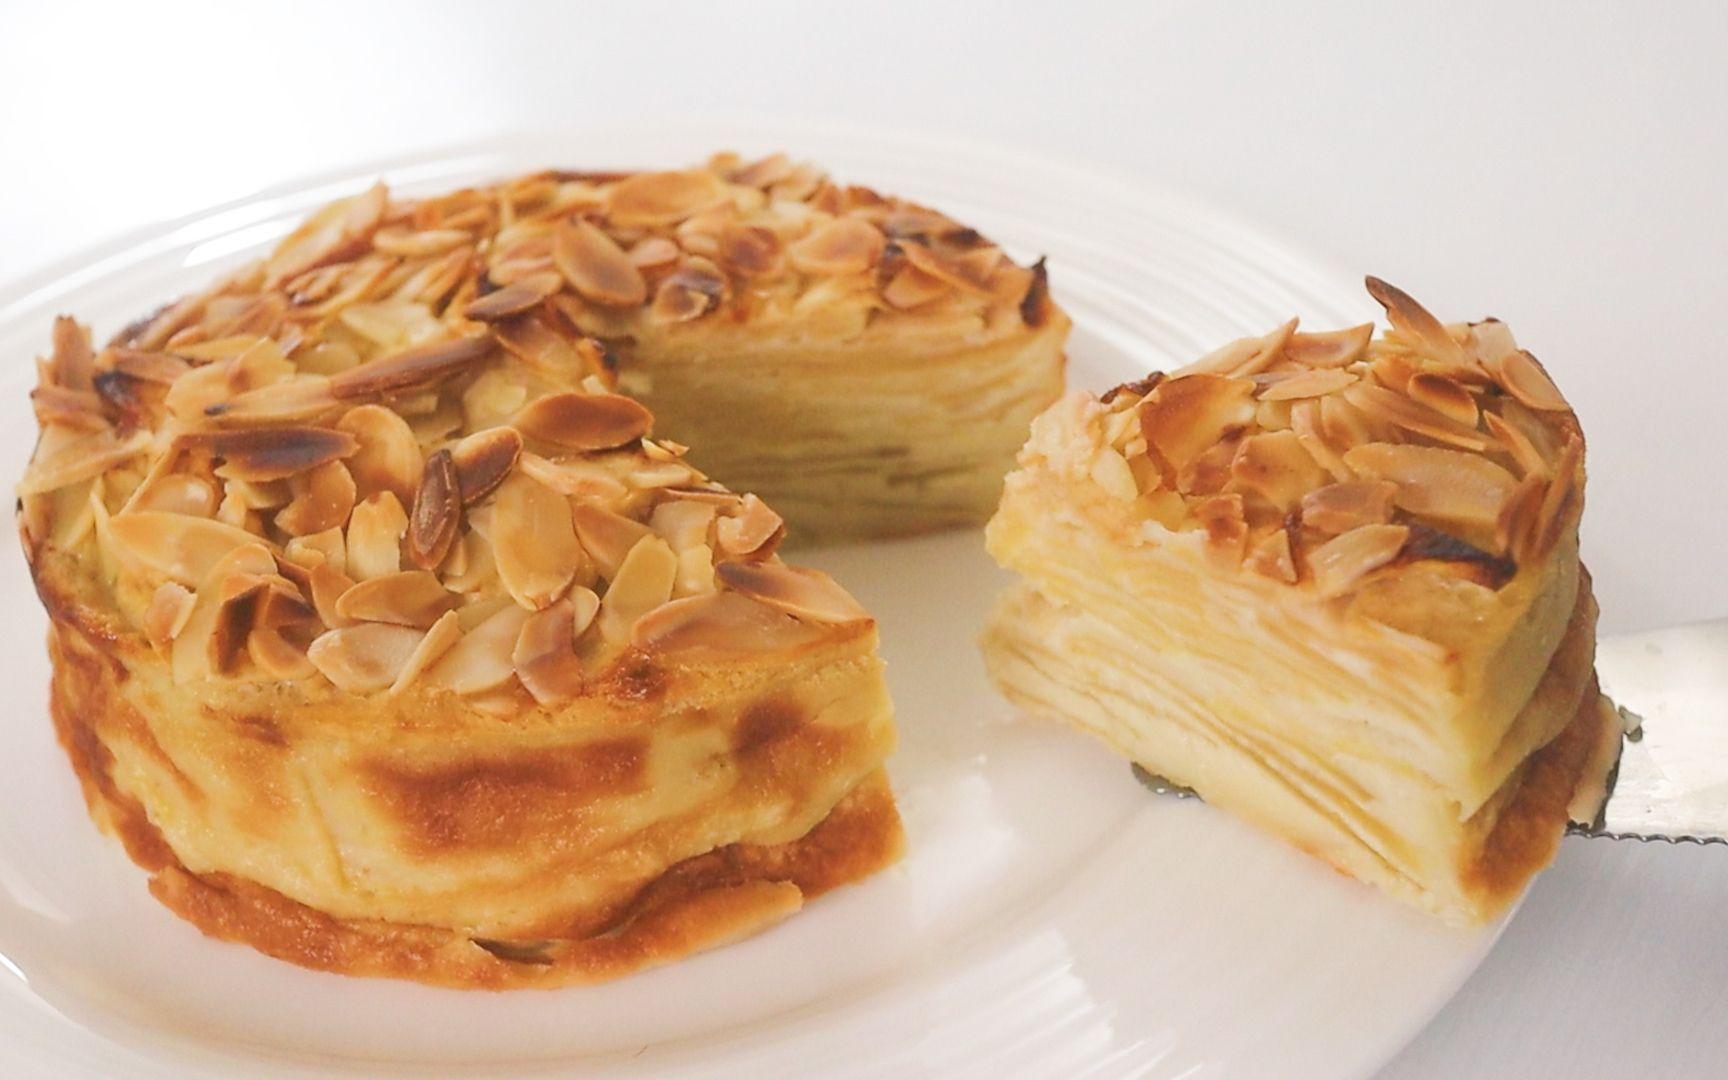 怎么做苹果蛋糕 | 低糖&低油